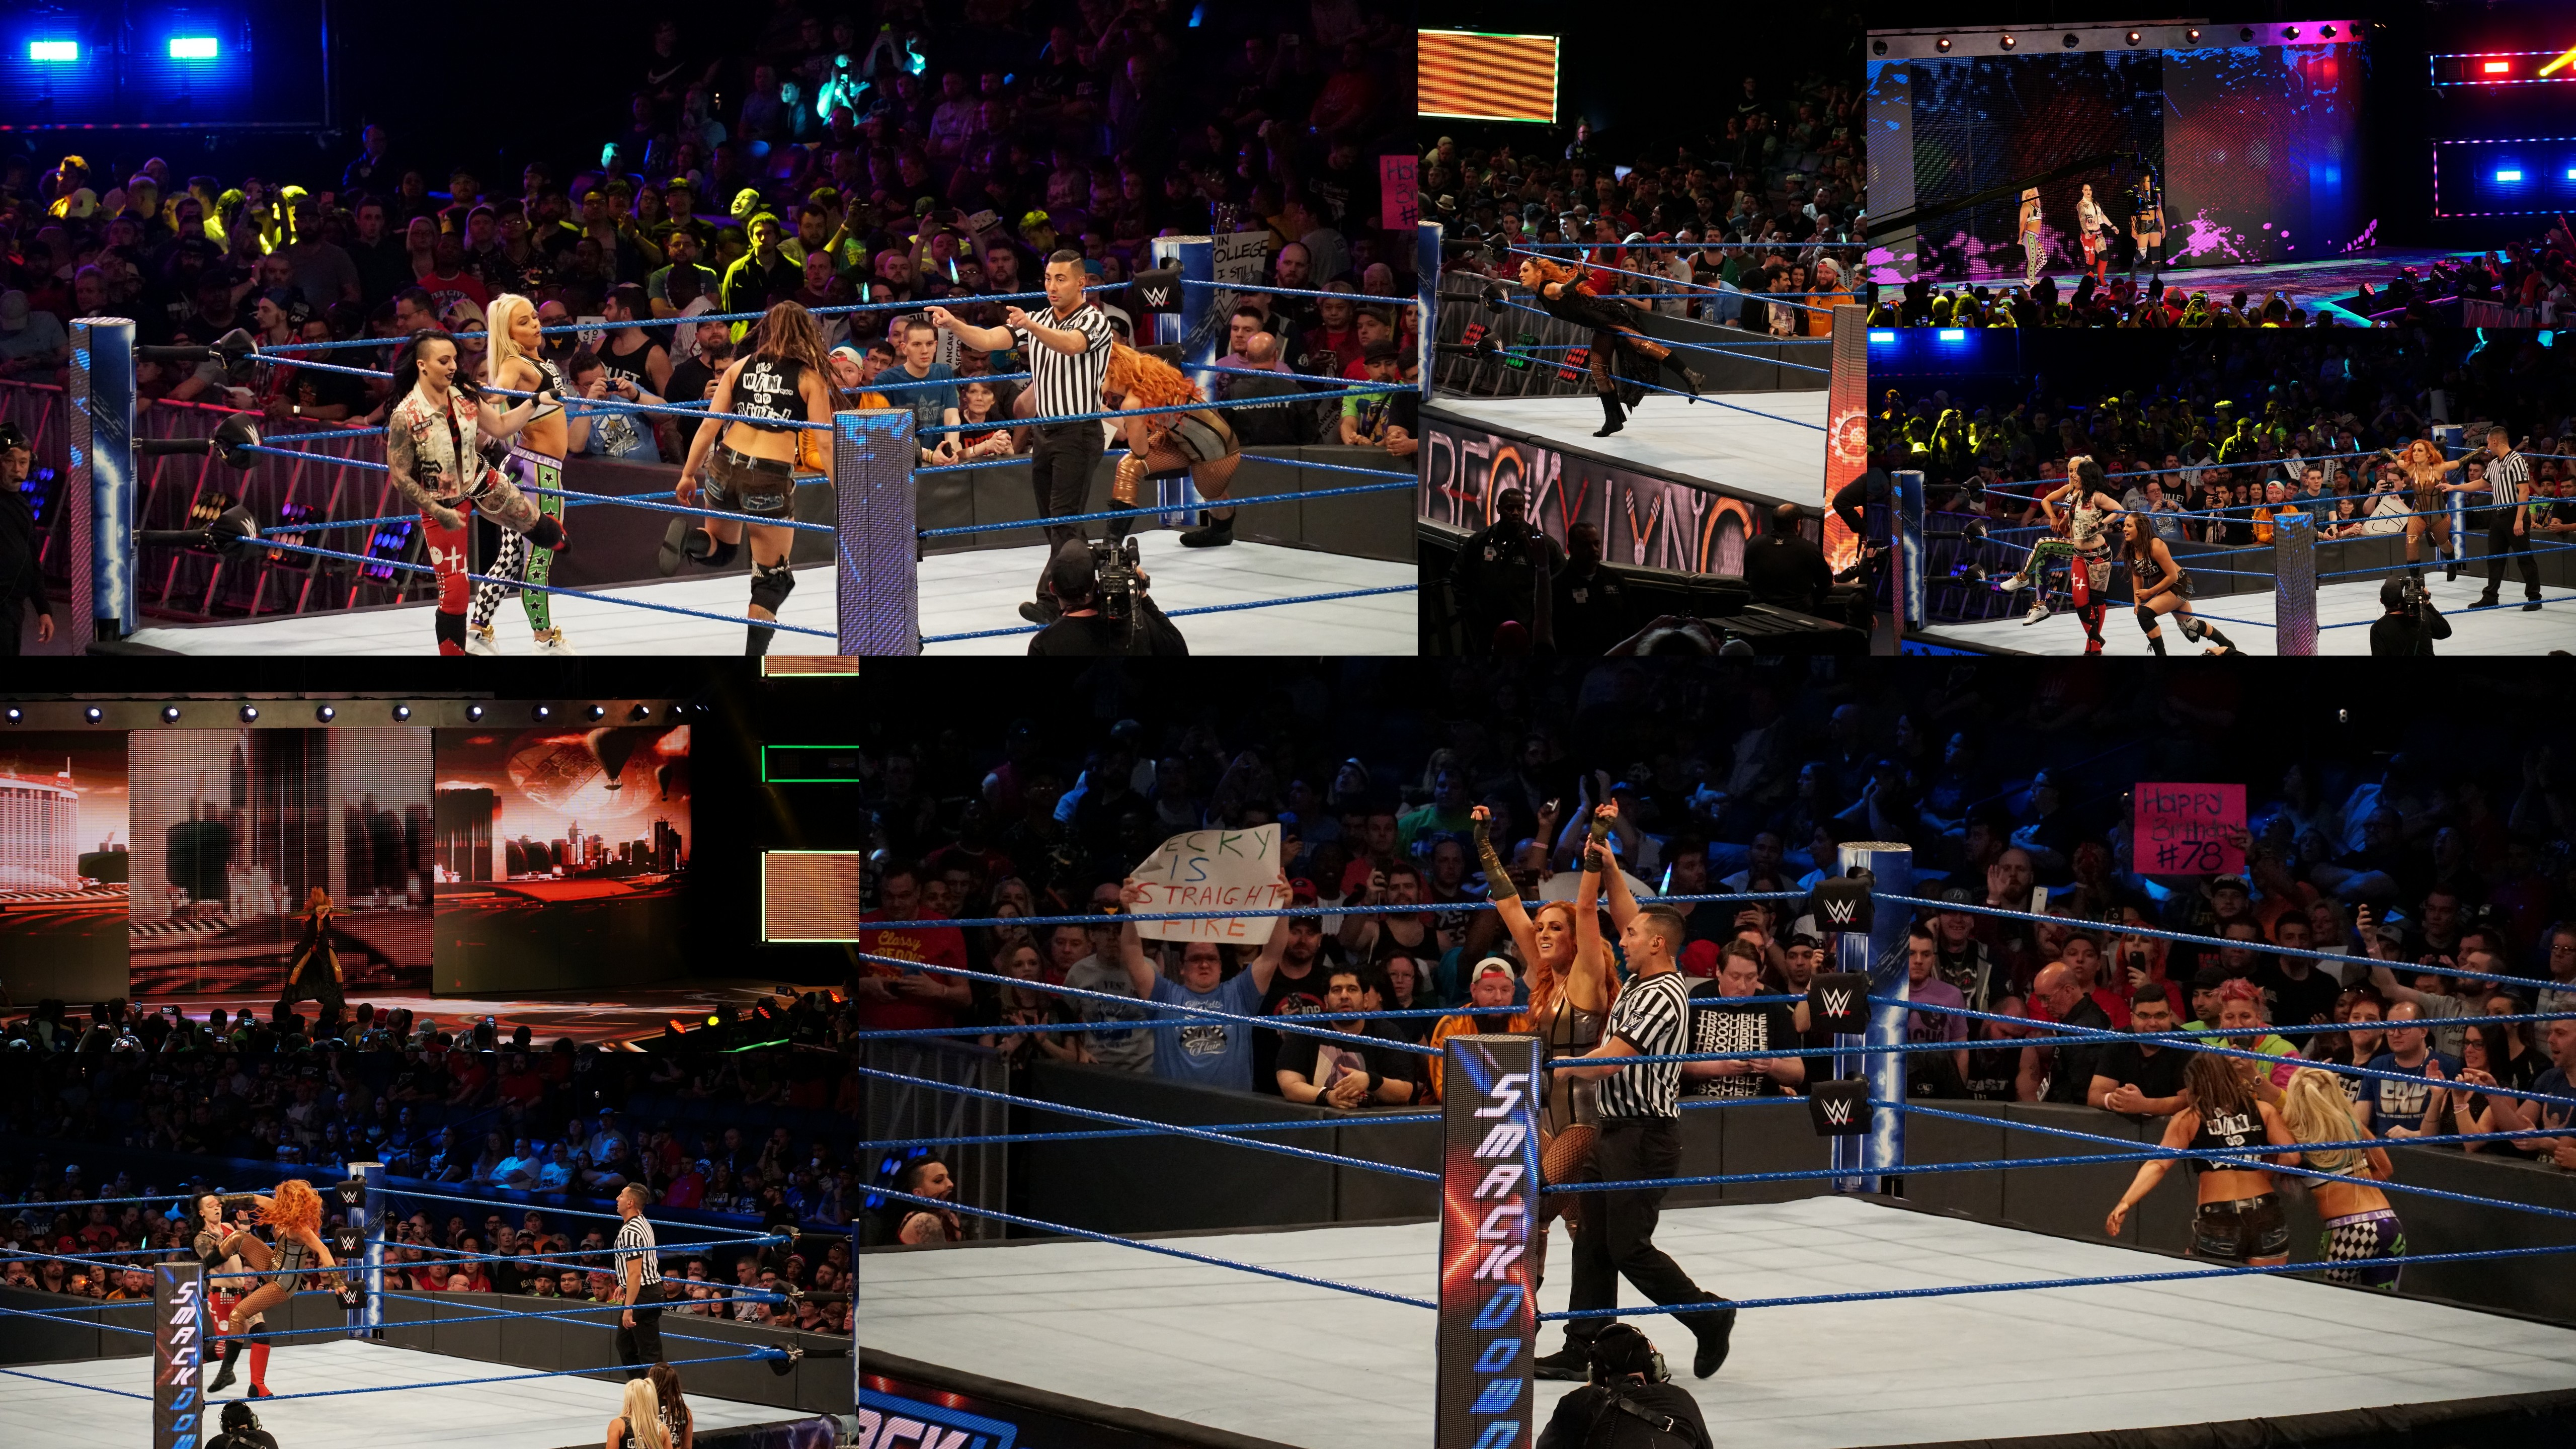 2018-04-10 18-43-36 XXX 2018-04-10 NOLA 2018-WWE Smackdown Live - Becky Lynch Vs Ruby Riott (41773488611).jpg NOLA 2018 - WWE Smackdown Live